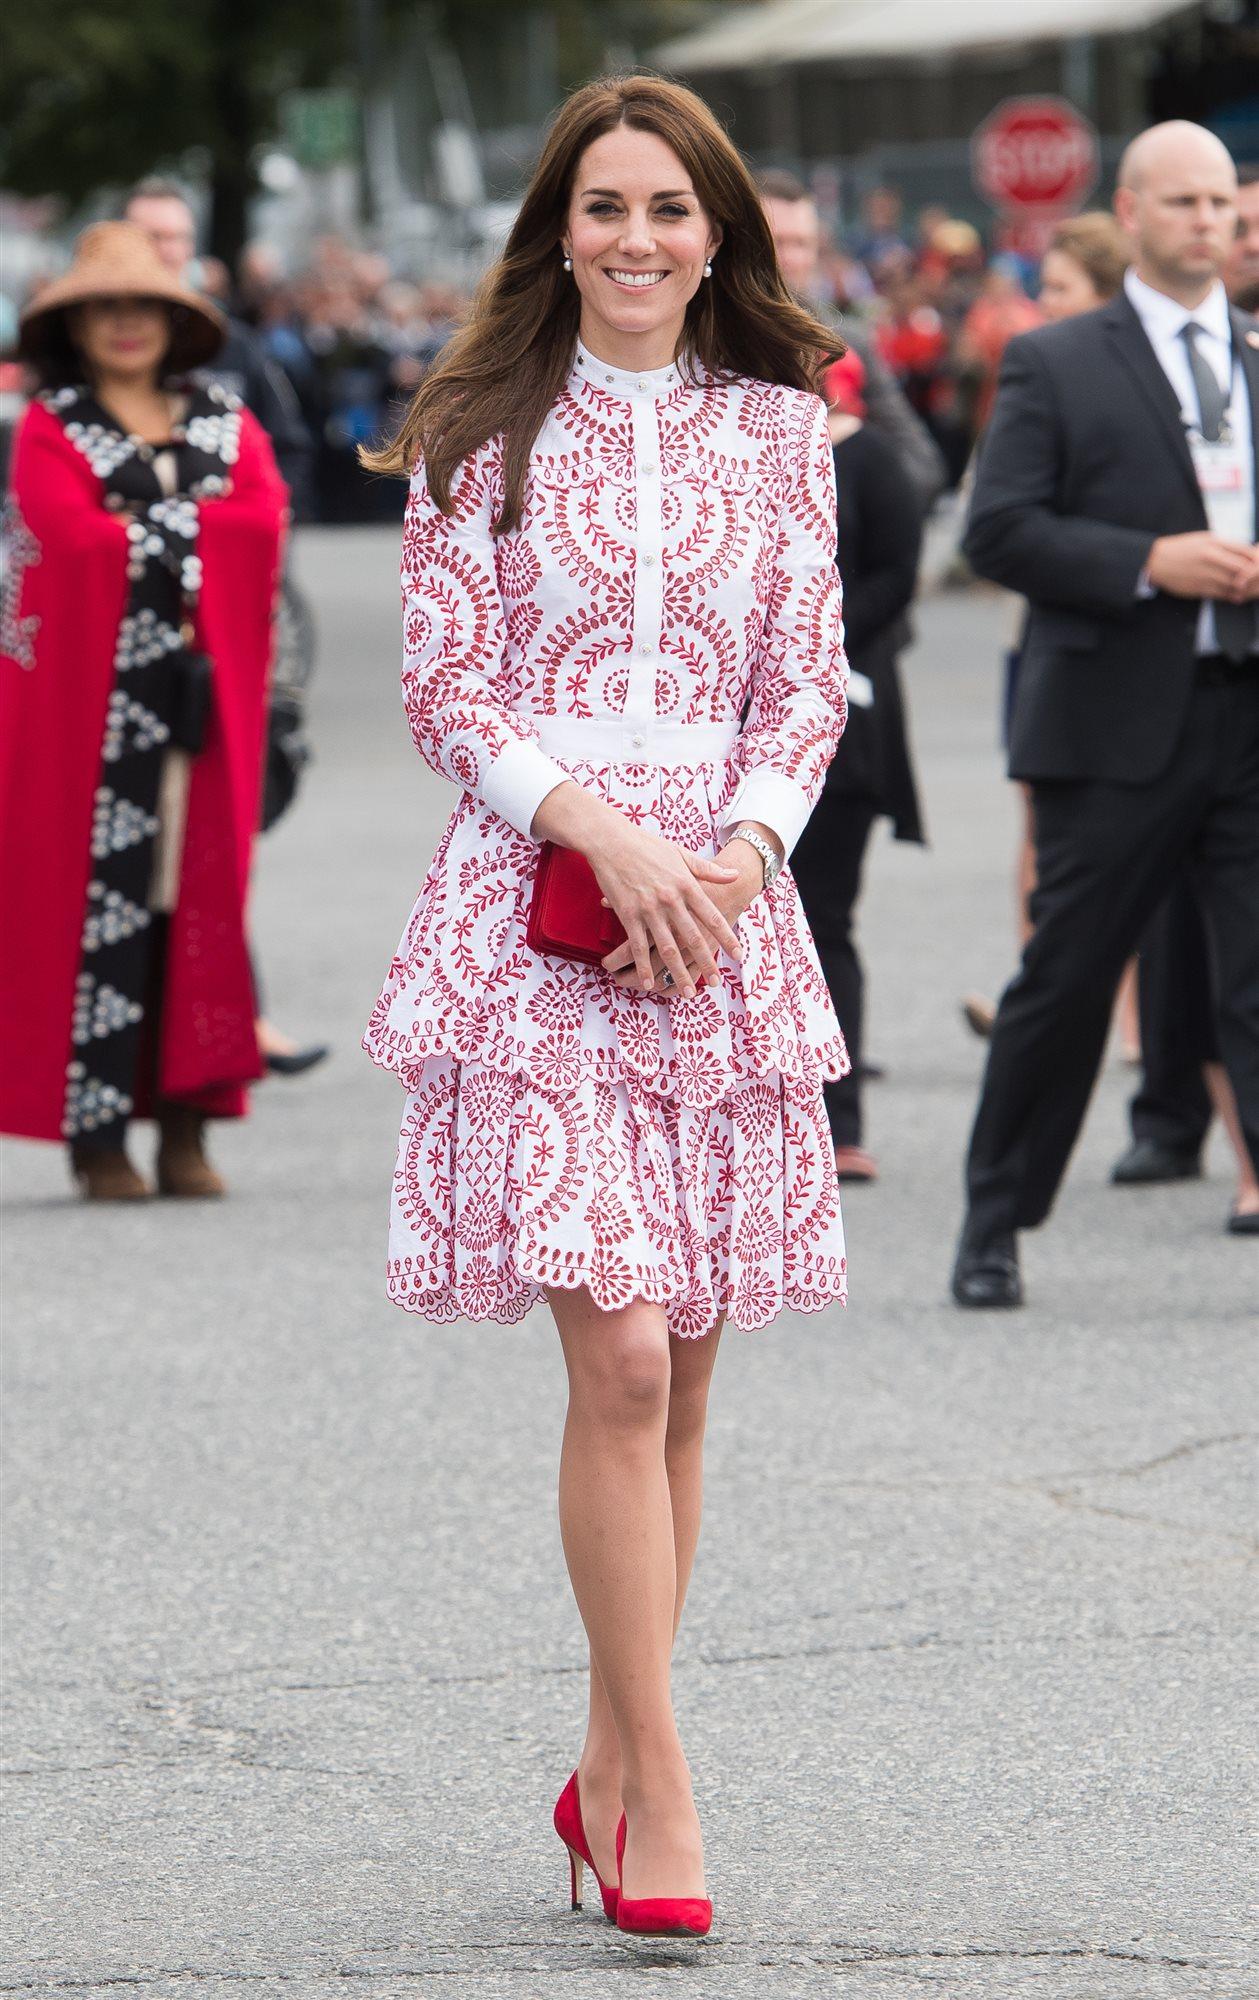 Encantador Vestido De Cóctel Kate Middleton Ilustración - Colección ...